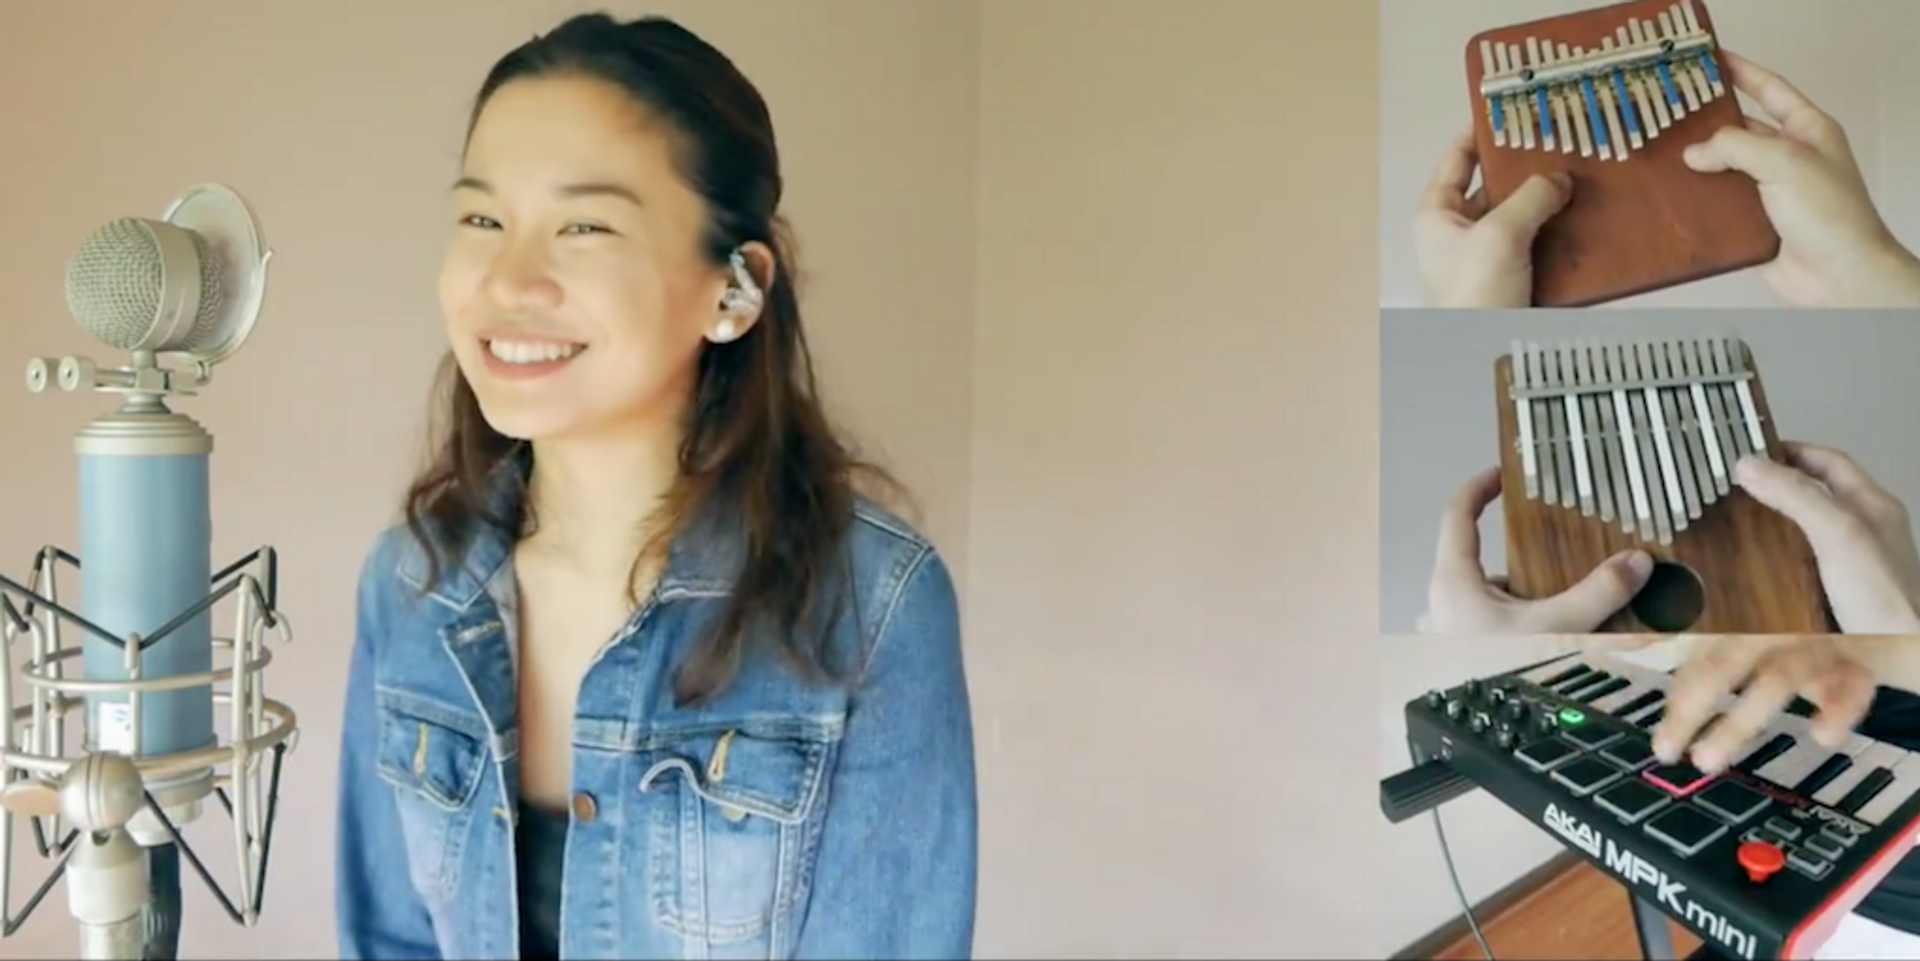 Dua Lipa's 'New Rules' gets a Kalimba twist with Bea Lorenzo – watch